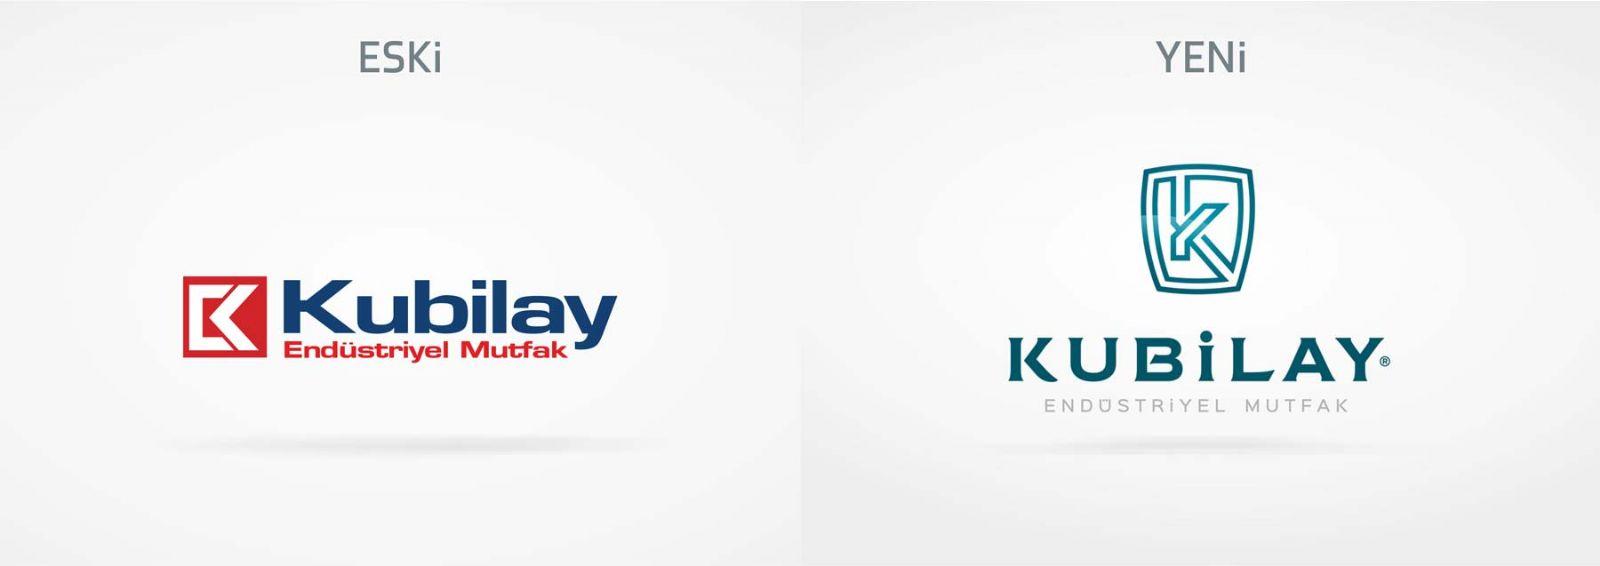 kubilay-mutfak-logo-revizyonu